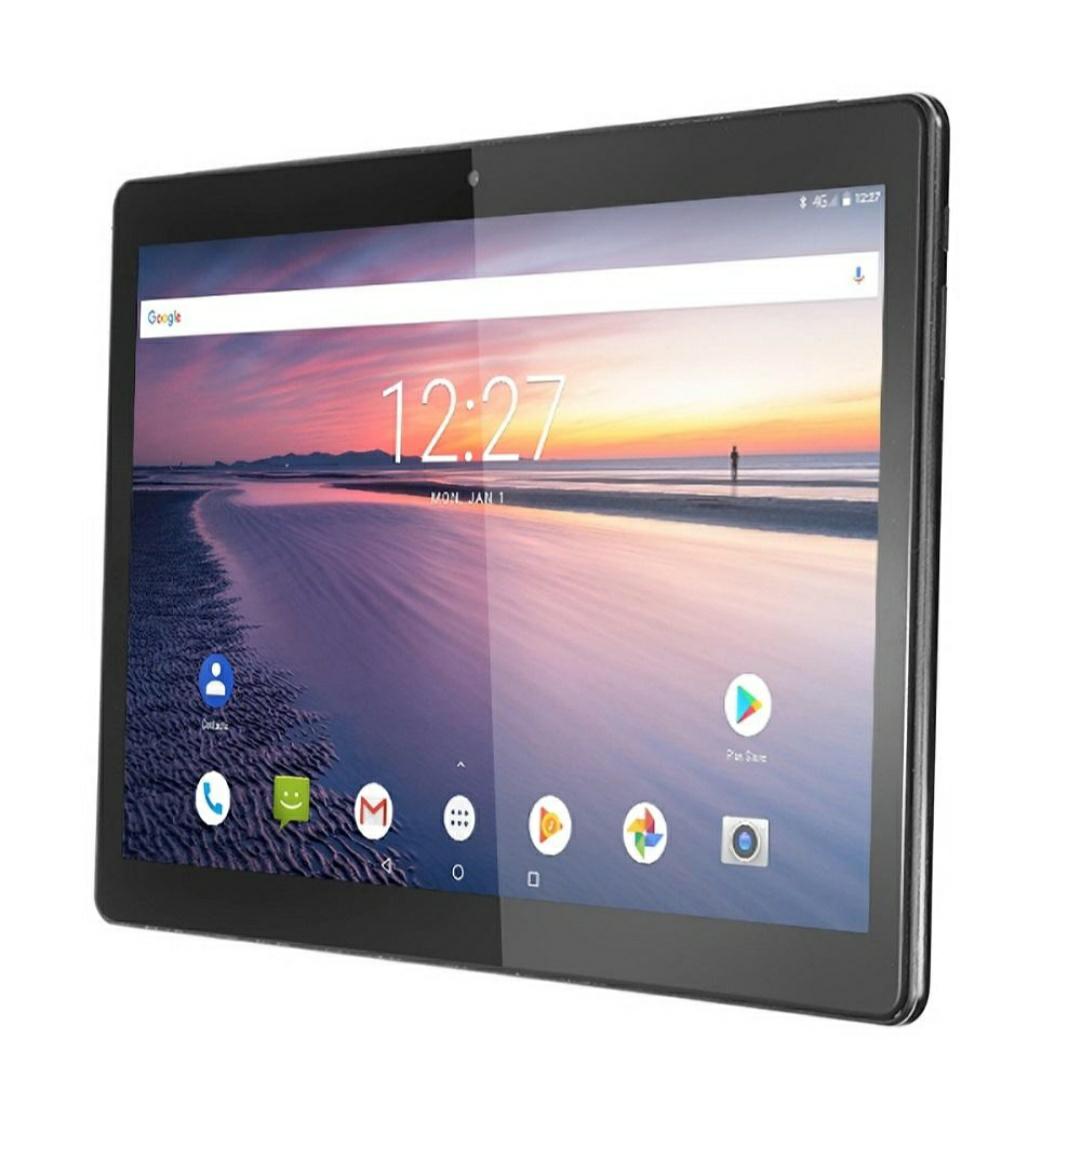 Original Box CHUWI Hi9 Air 64GB MT6797D X23 Deca Core 10.1 Inch 2K Screen Android 8 Dual 4G Tablet £118.90 @ BangGood